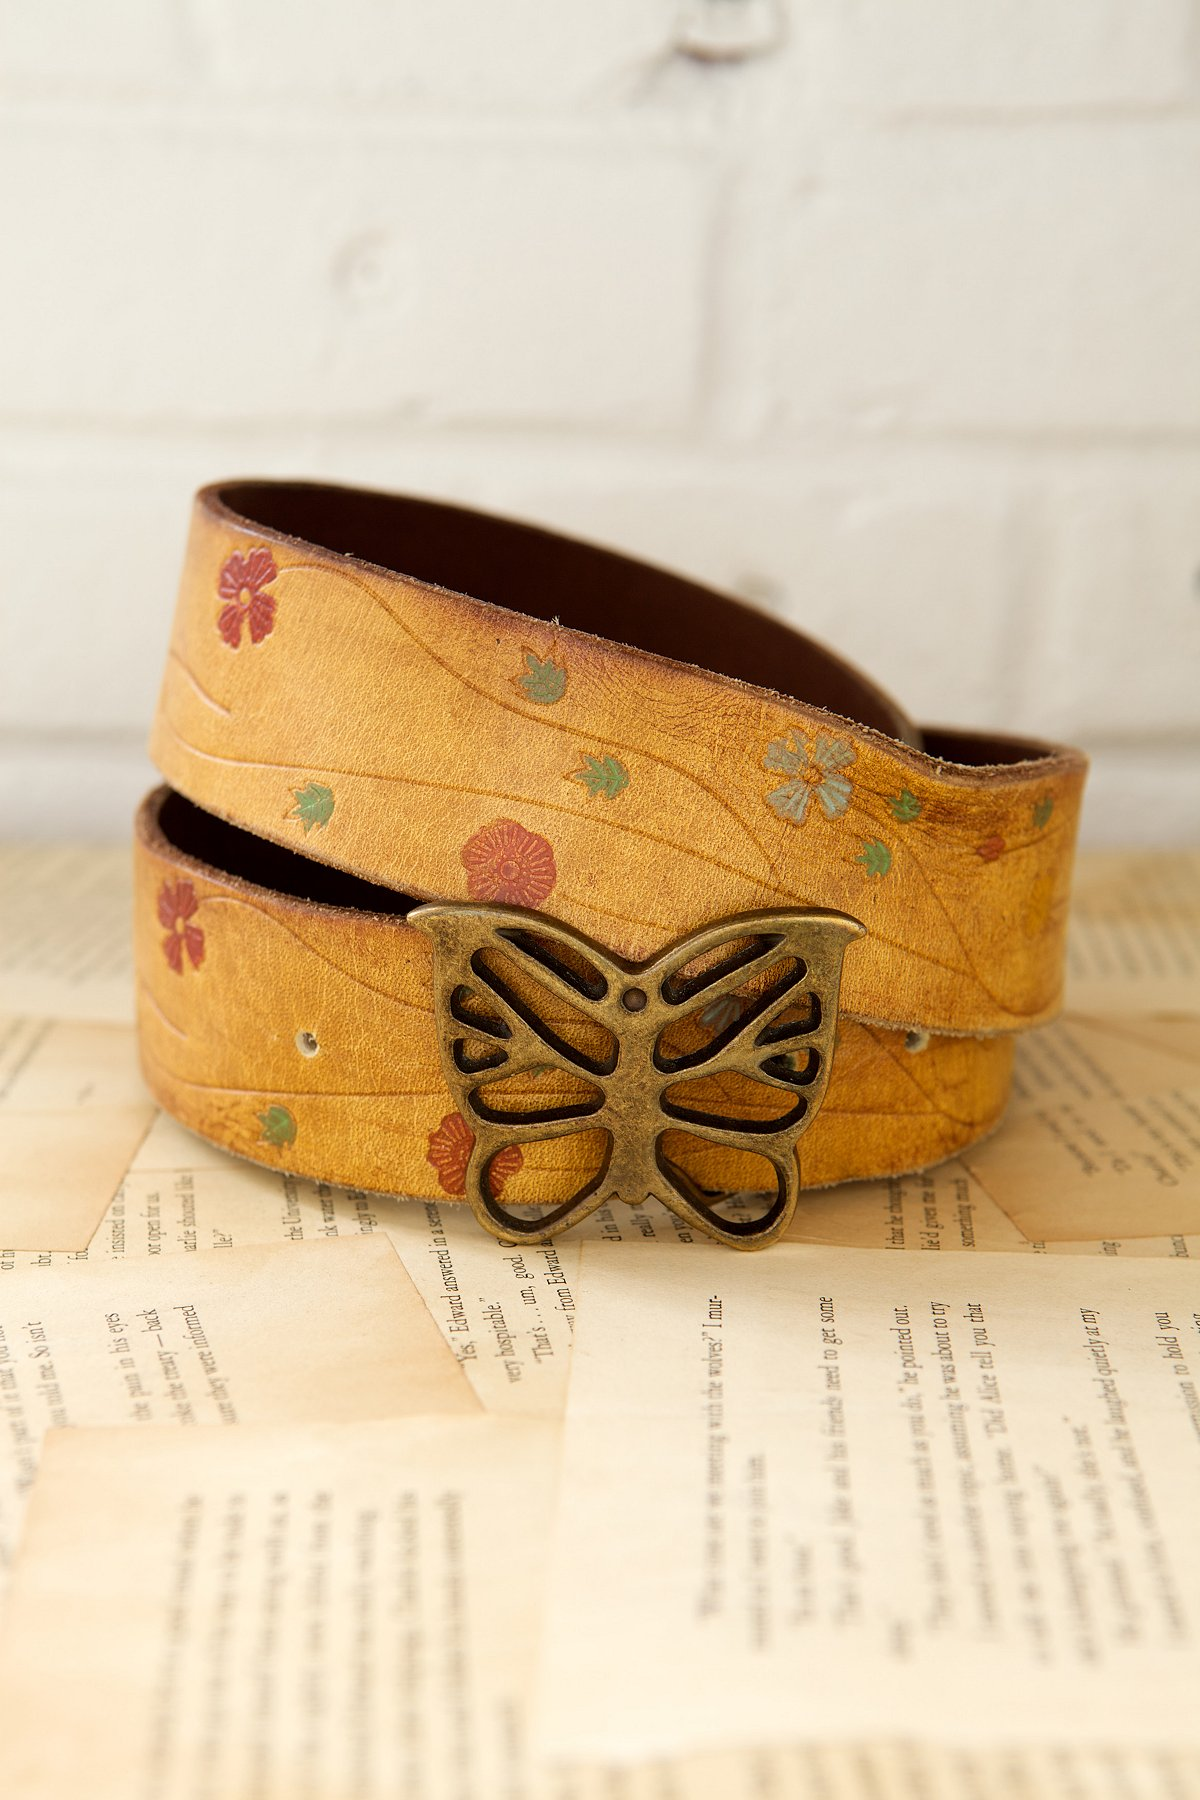 Vintage 1970s Monarch Belt